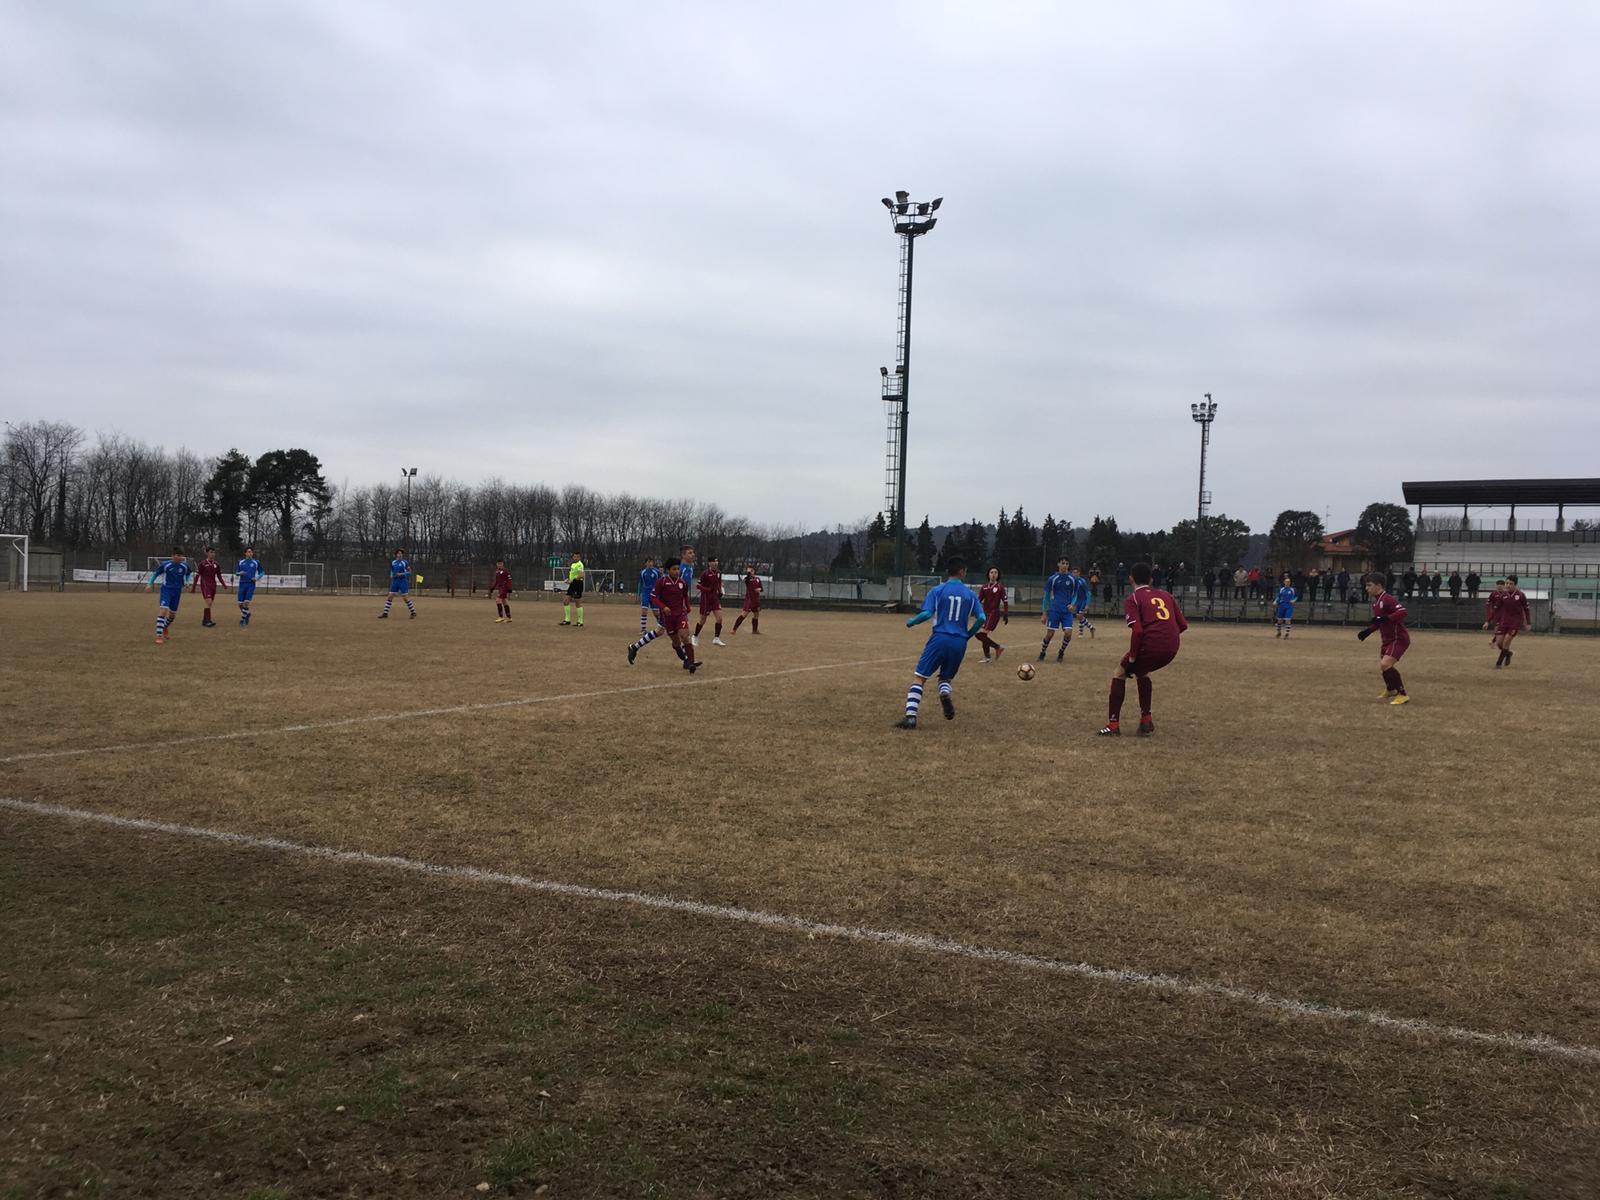 Giovanissimi Provinciali 2004 – Gir. A: pari nel derby. Gir. B: big match in parità. Gir. C: 8 reti a Laveno